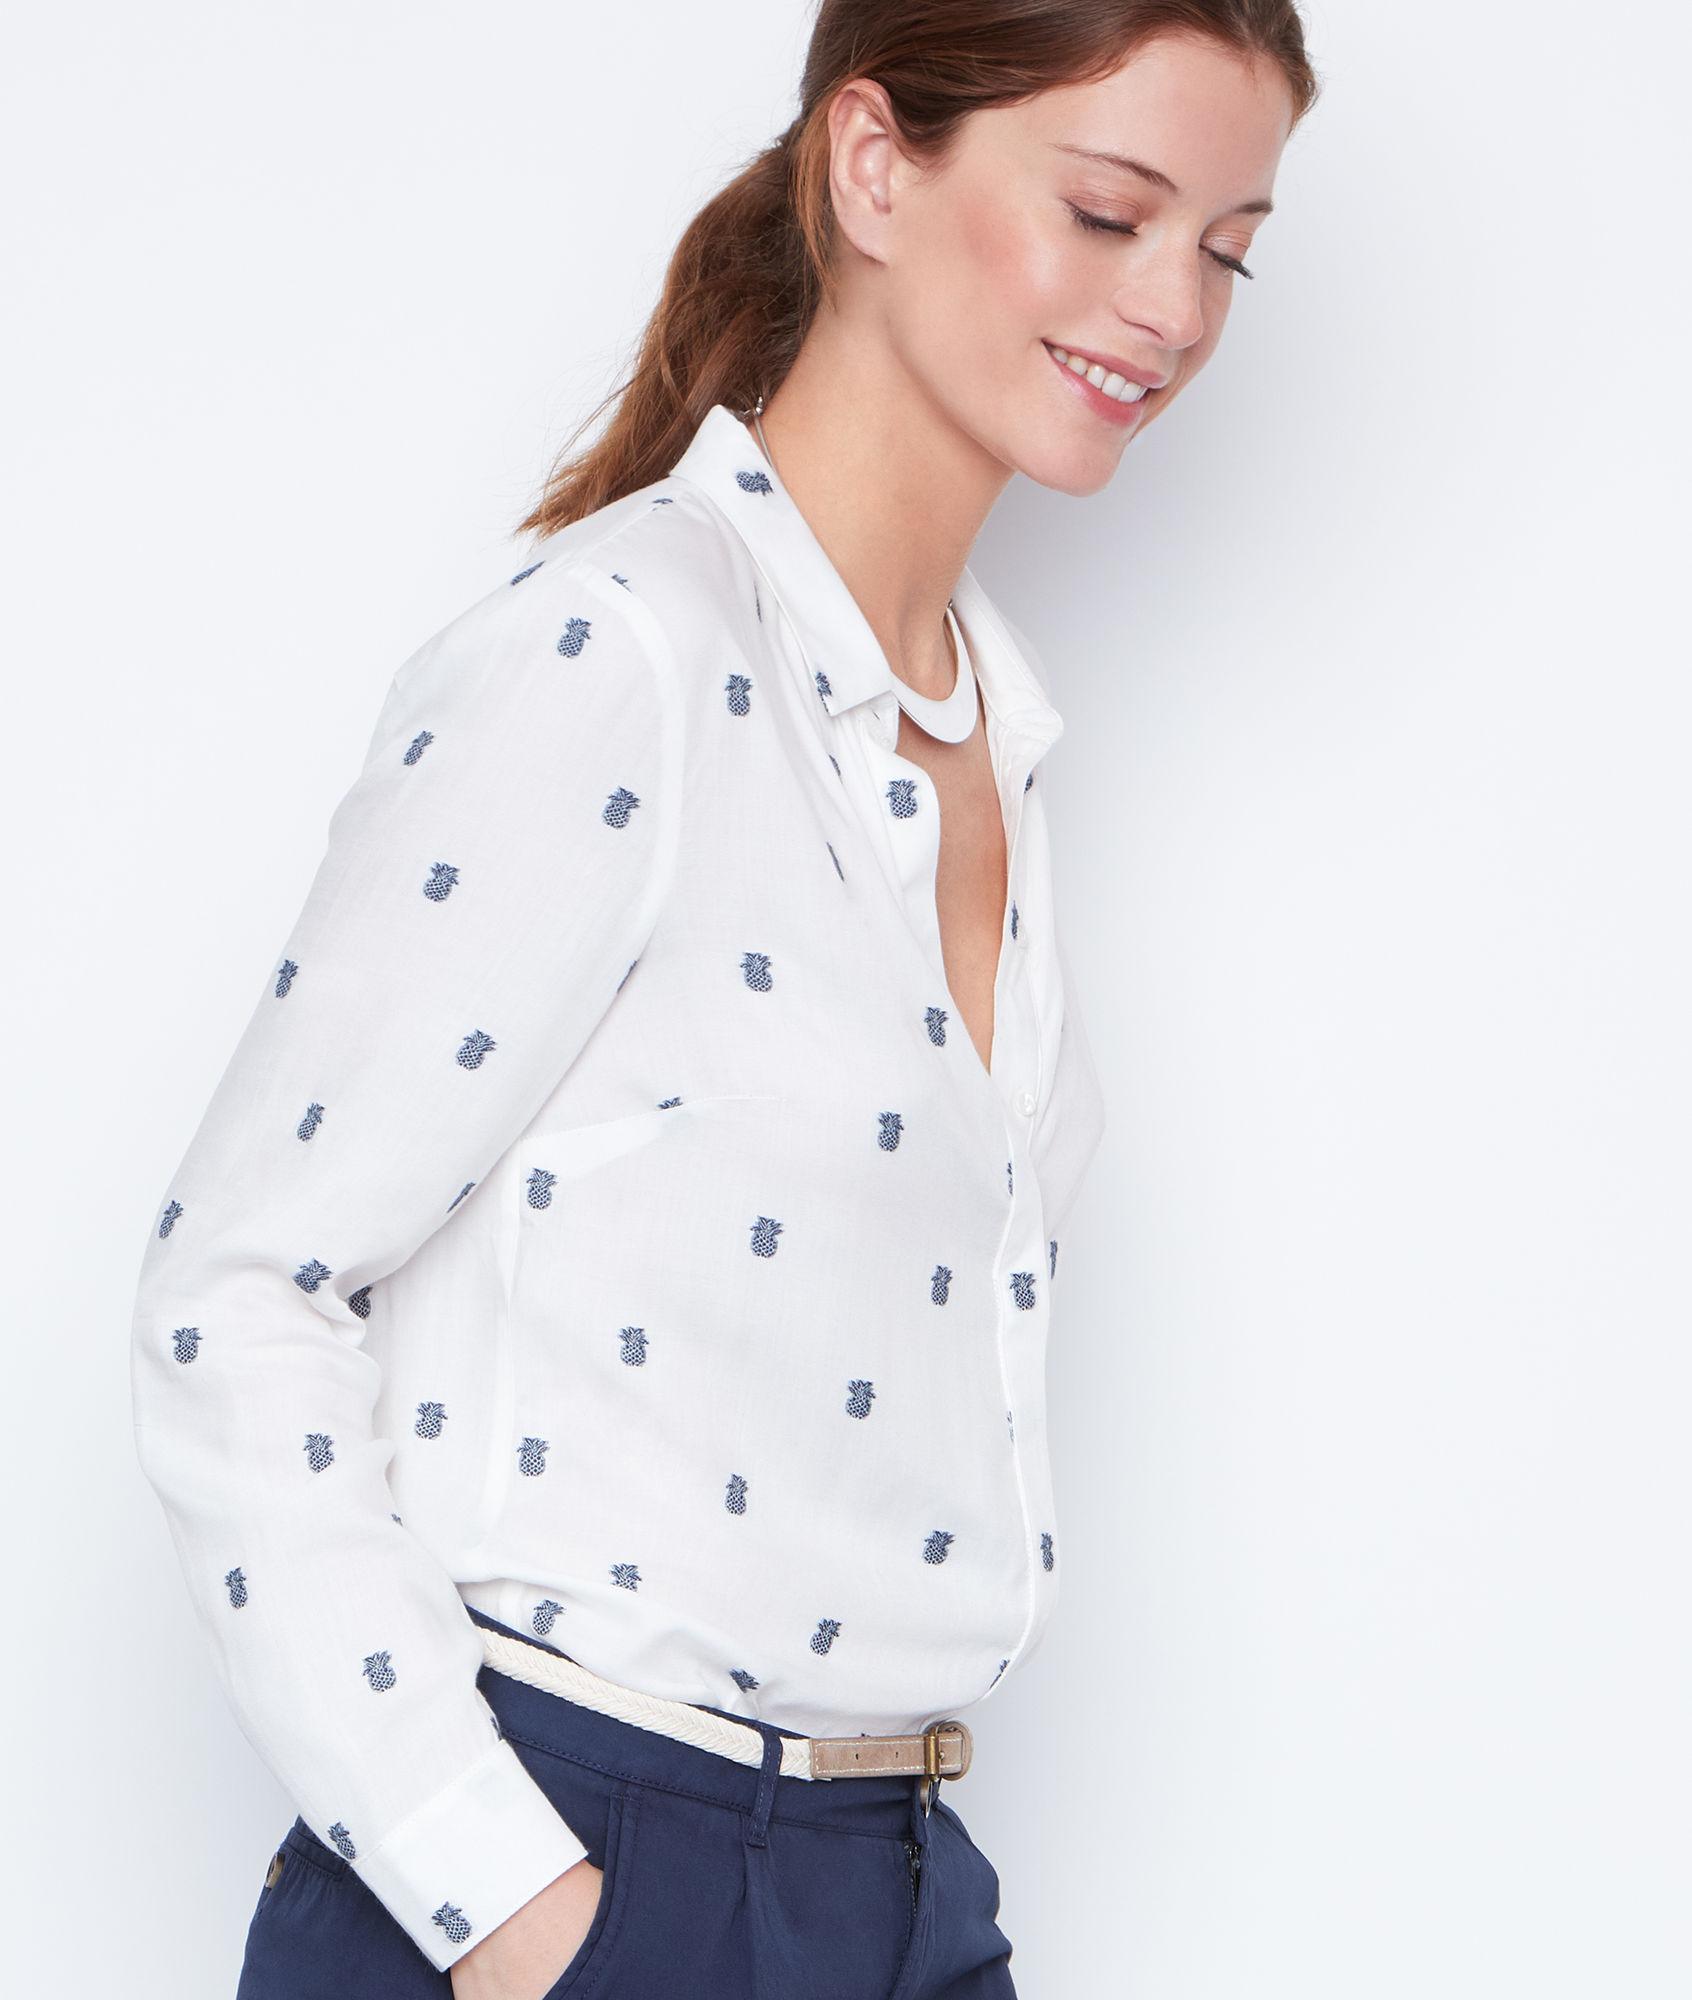 Рубашка боди с принтом